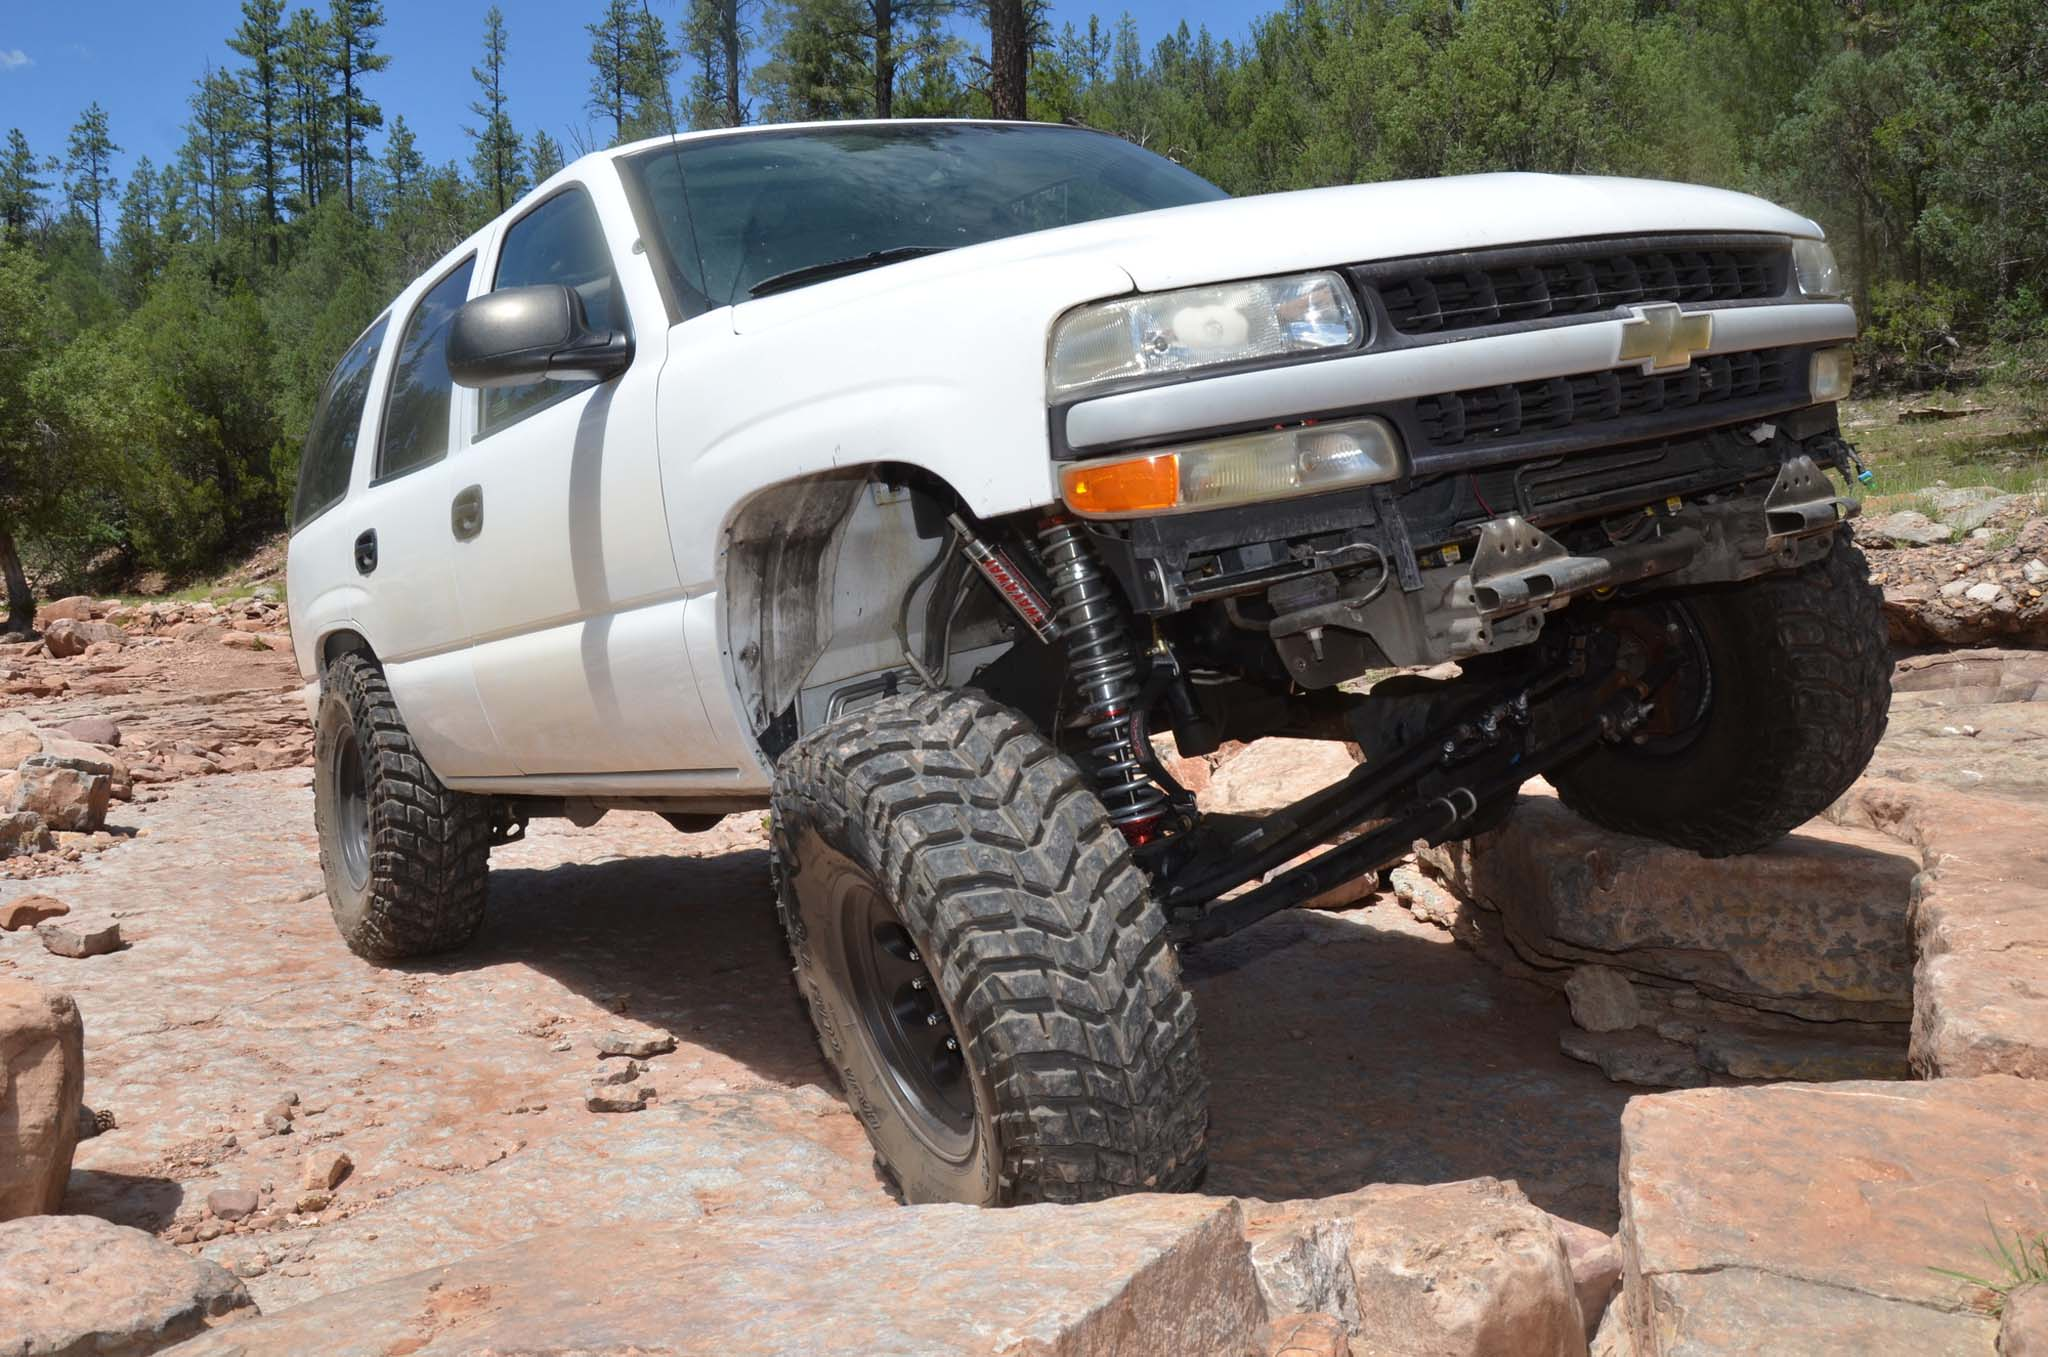 hight resolution of 2005 chevy tahoe drivetrain and axle upgrade rosco p drivetrain